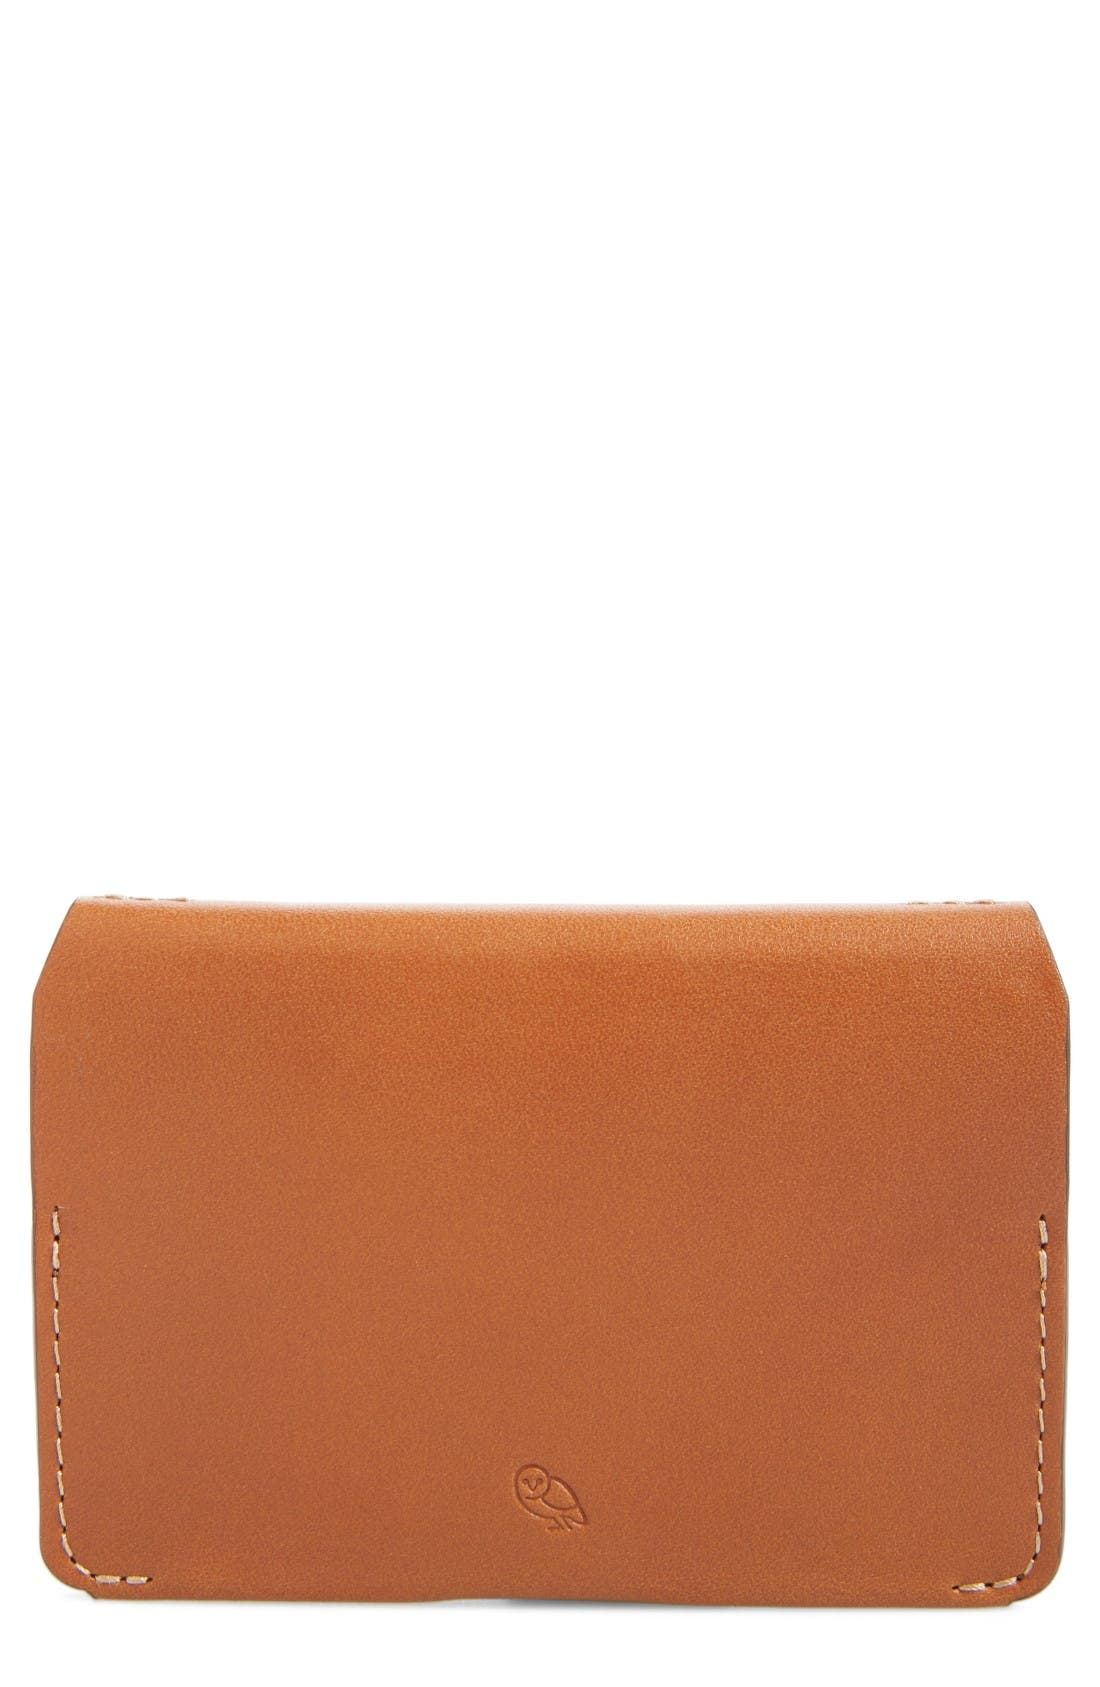 Leather Card Case,                             Main thumbnail 1, color,                             Caramel